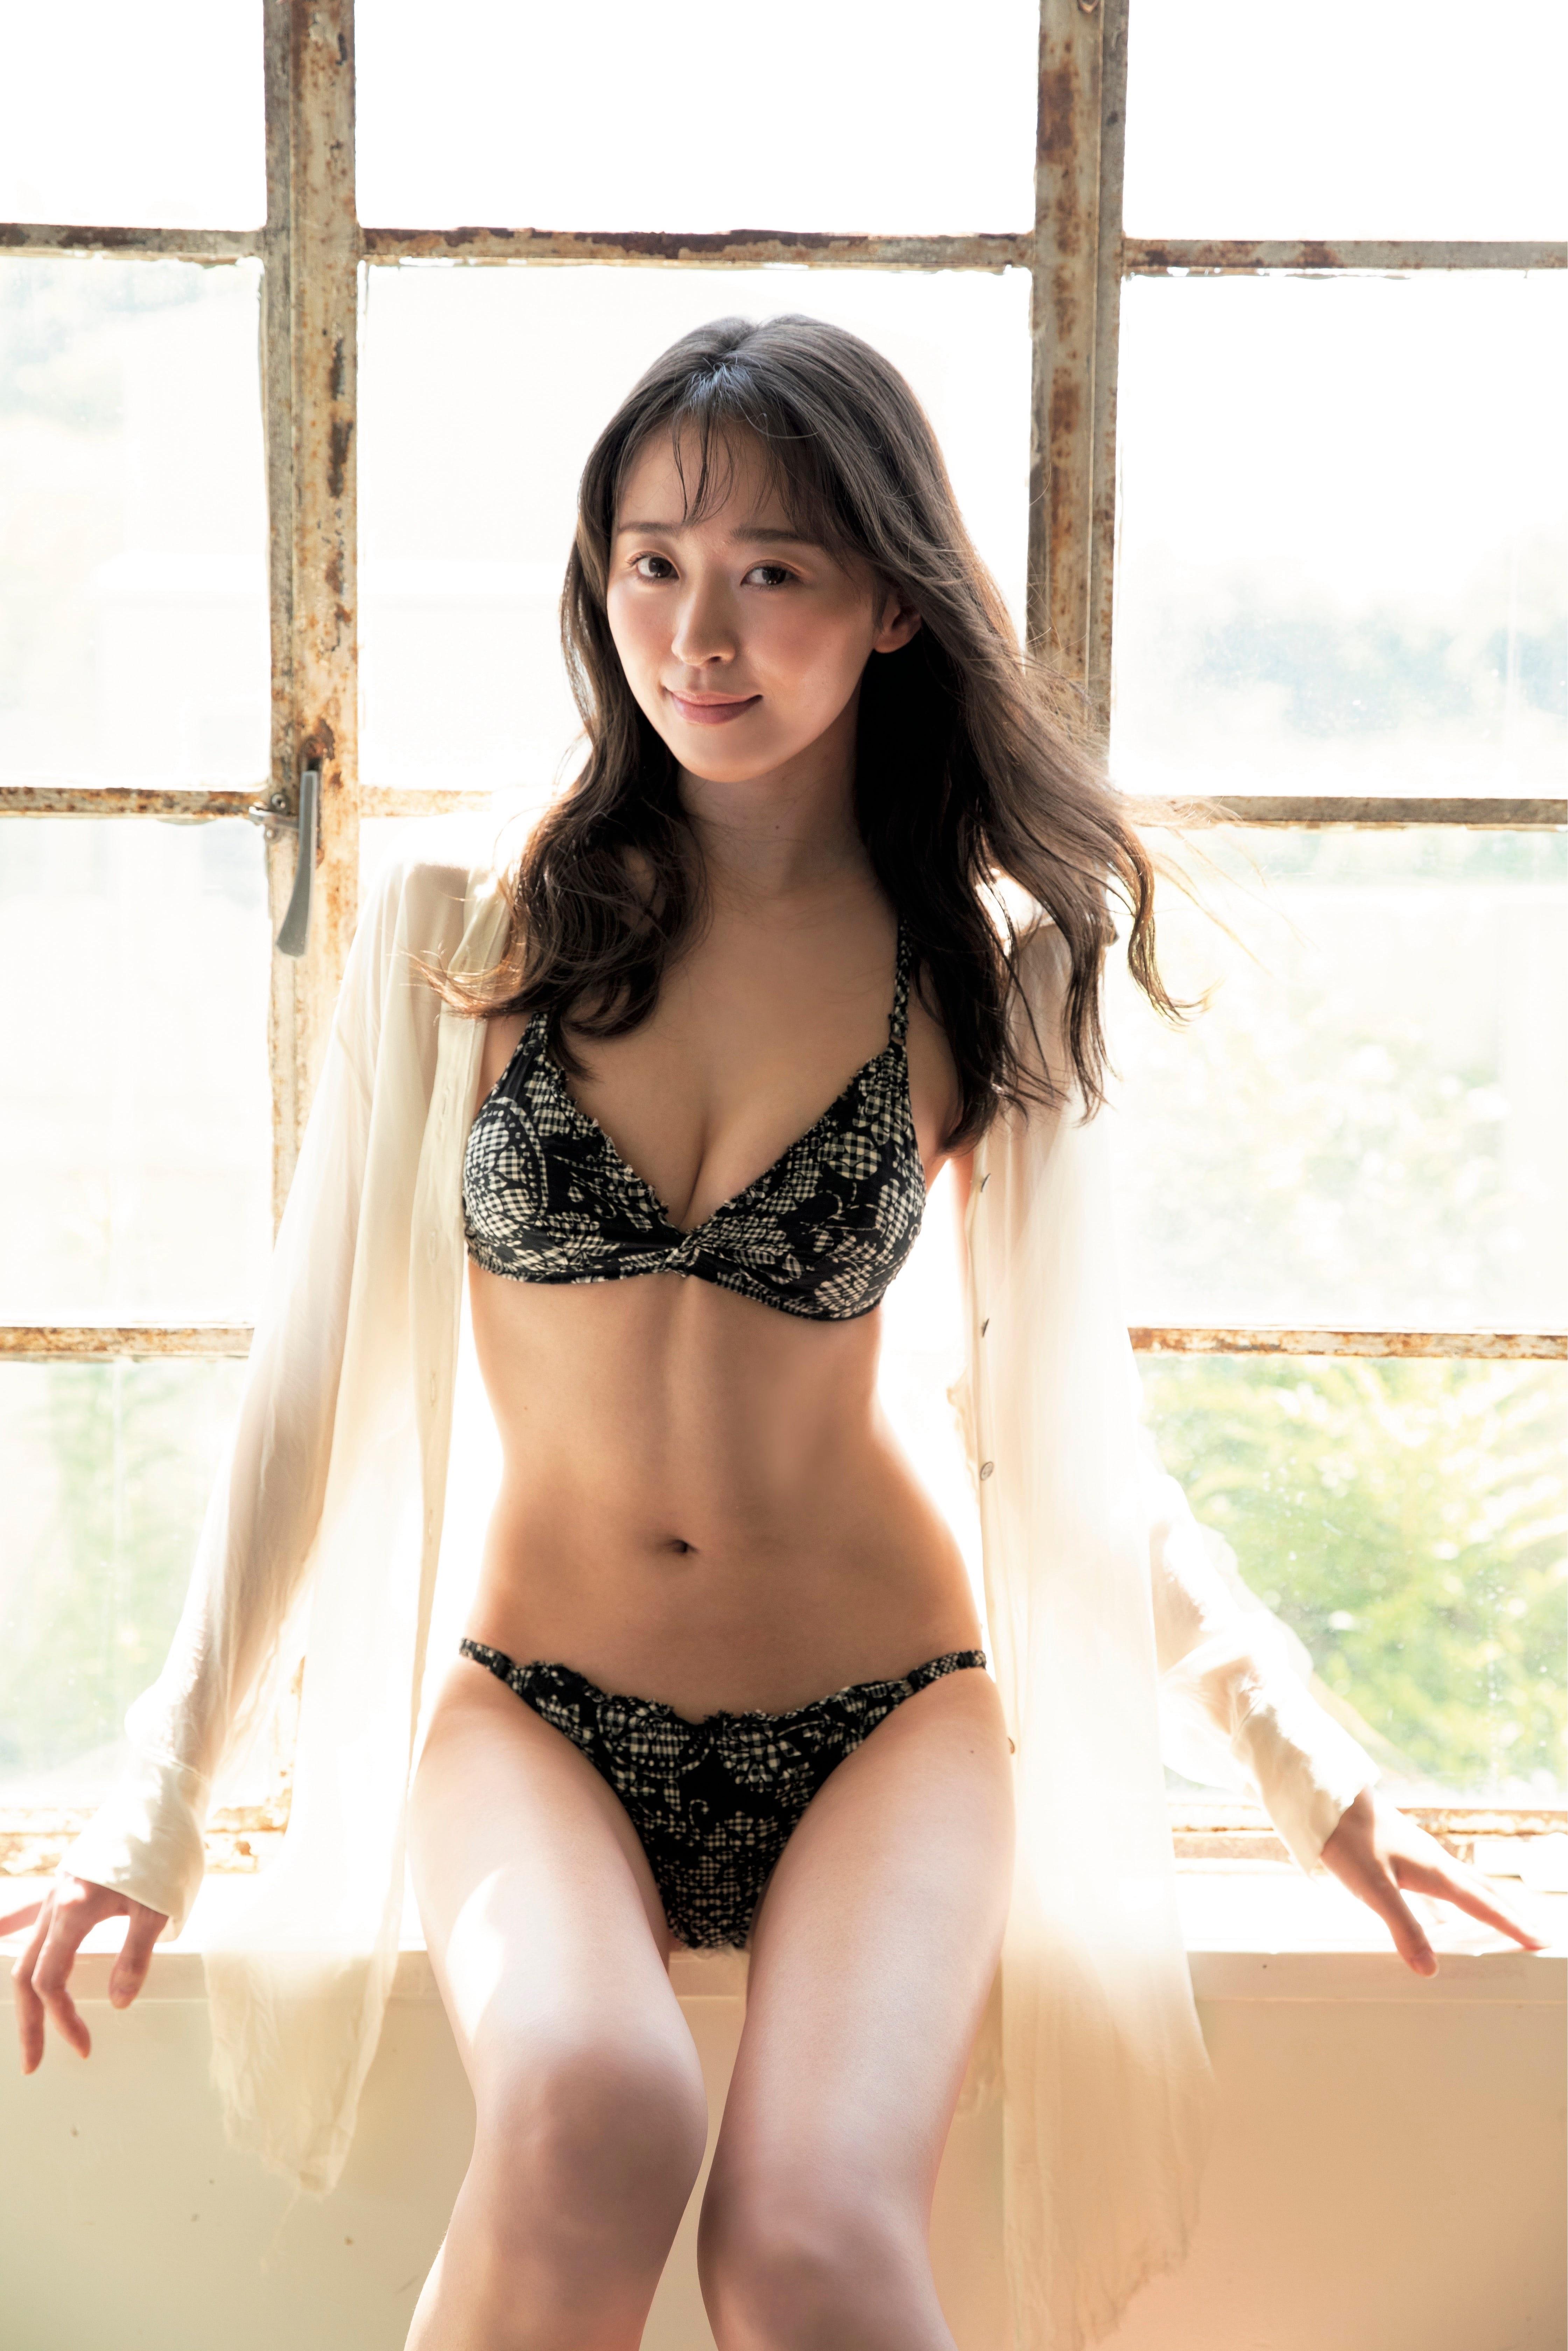 enako 雪平莉左-FLASH 2021年9月14日刊 高清套图 第29张